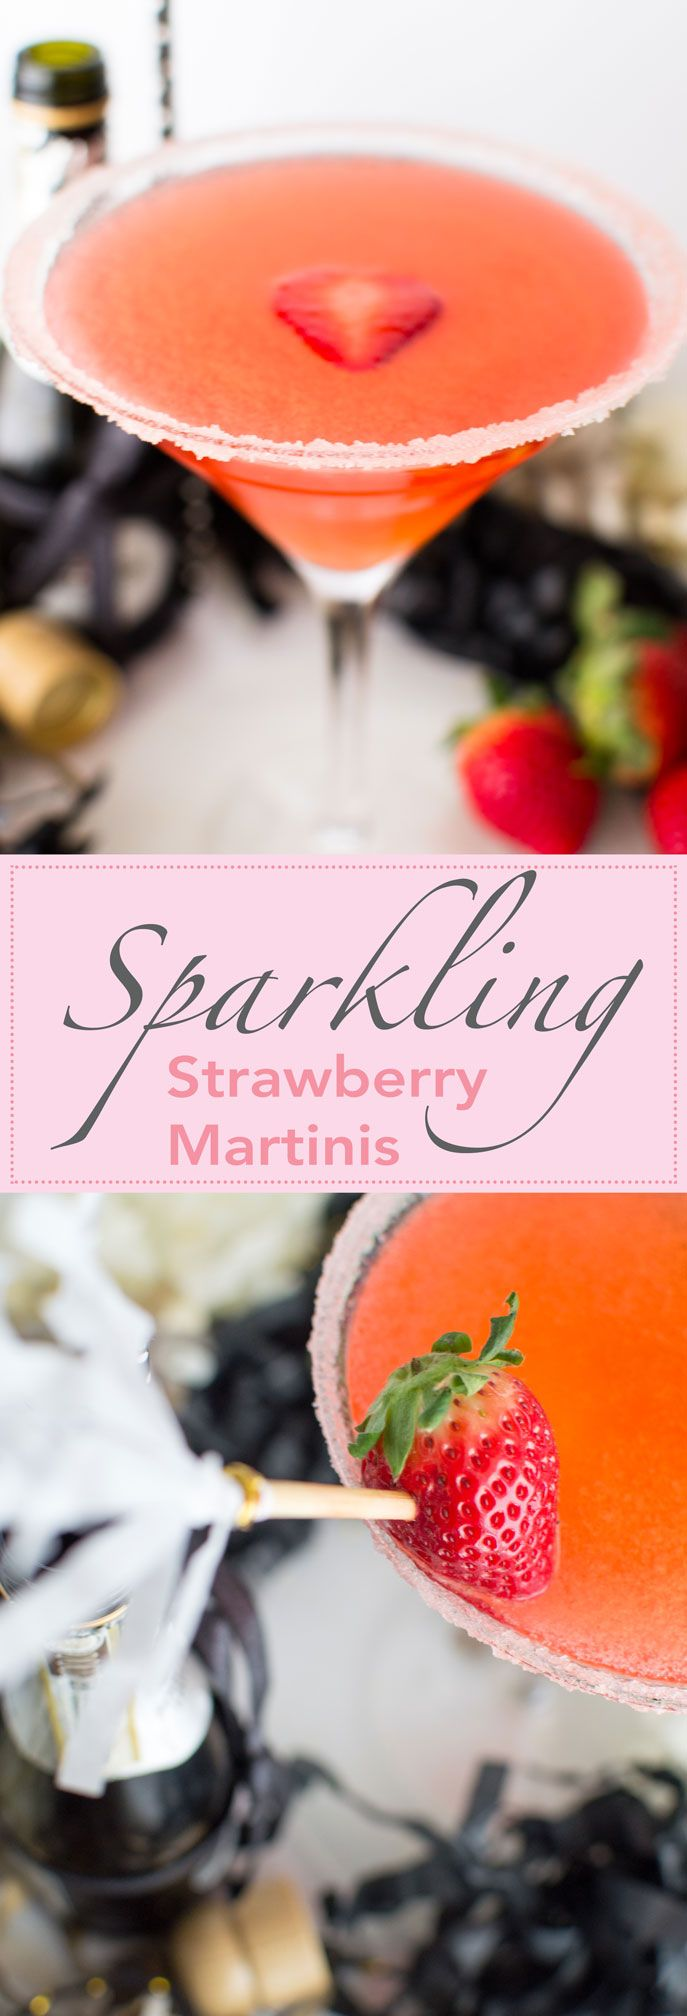 Muddled strawberries, vodka & champagne make this festive cocktail dangerously easy to enjoy!